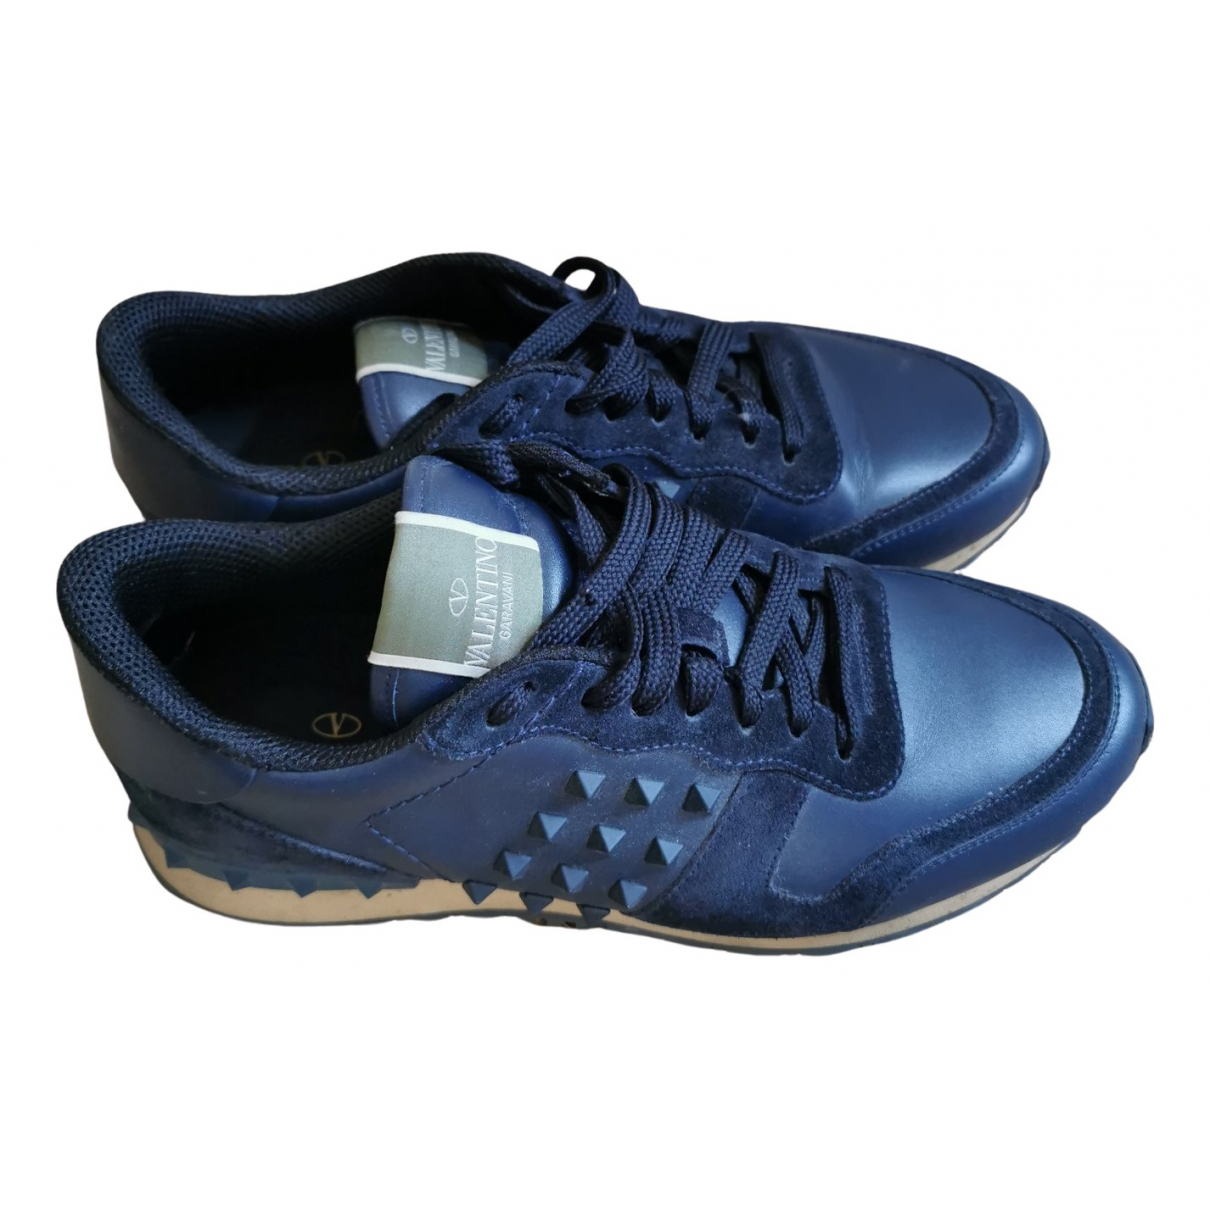 Valentino Garavani Rockrunner Navy Leather Trainers for Men 41 IT